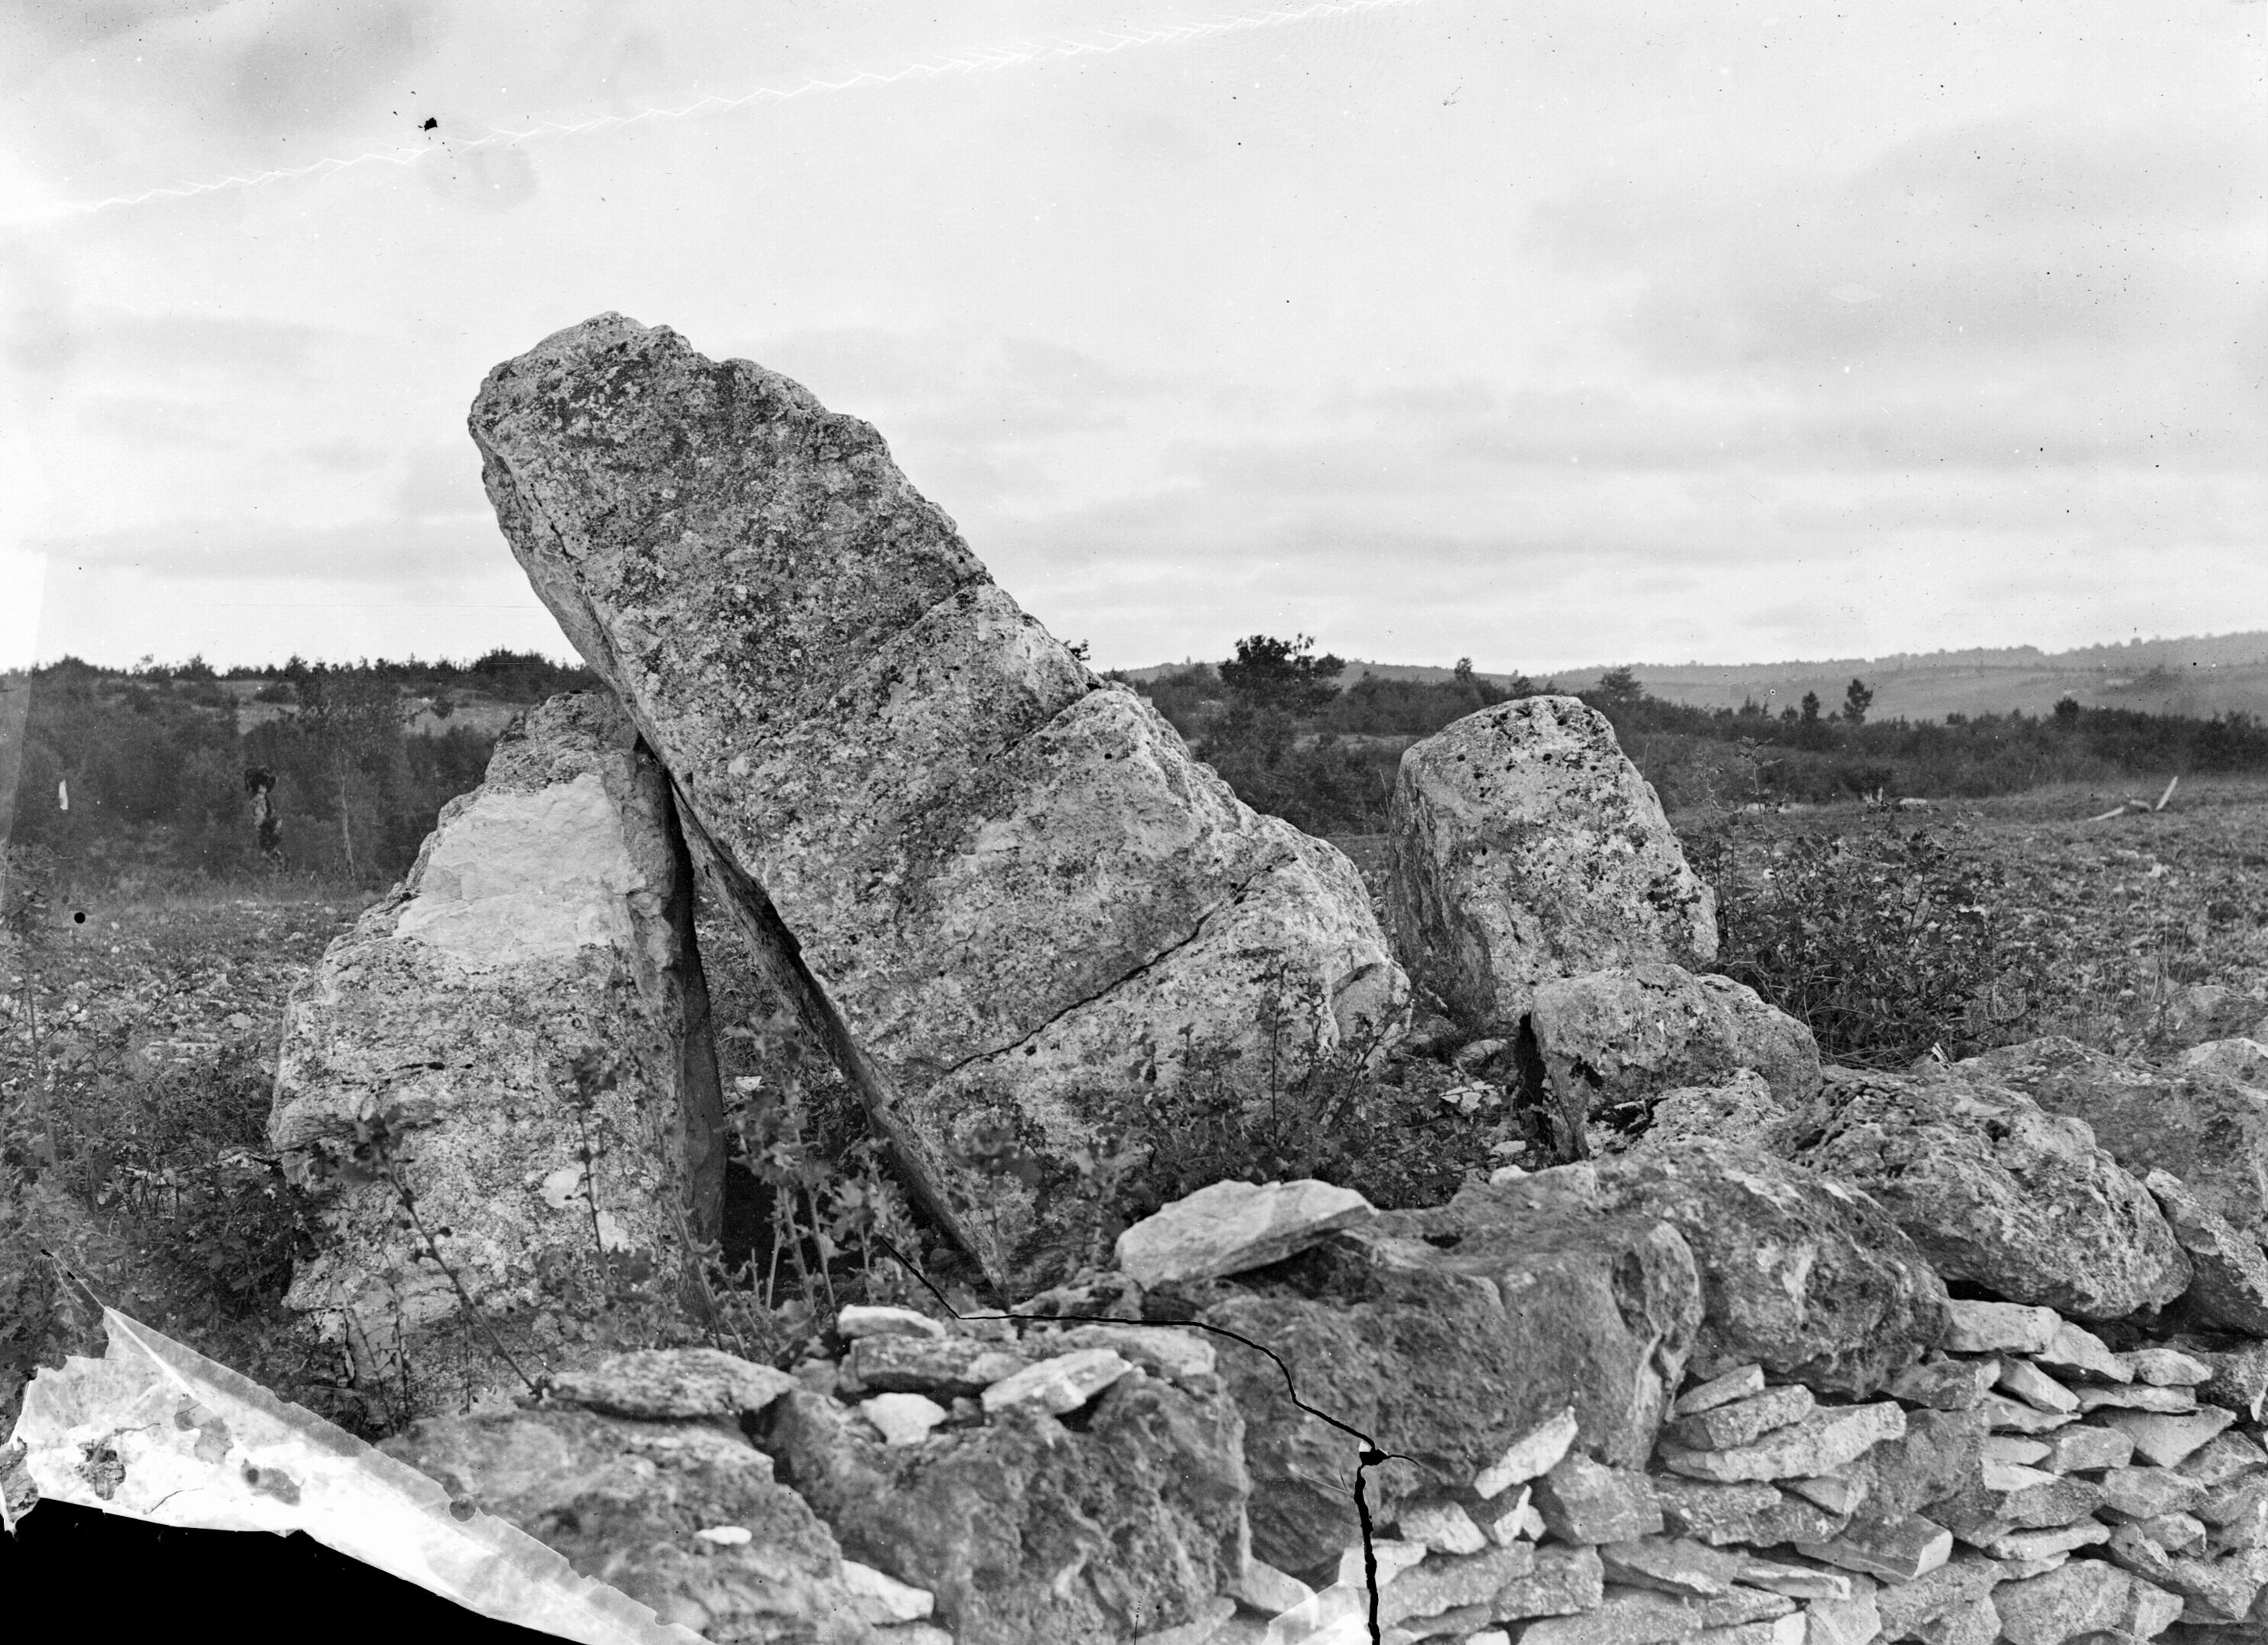 File:Cahuzac, dolmen du Verdier, septembre 1891 (Tarn) (8551445570 ...